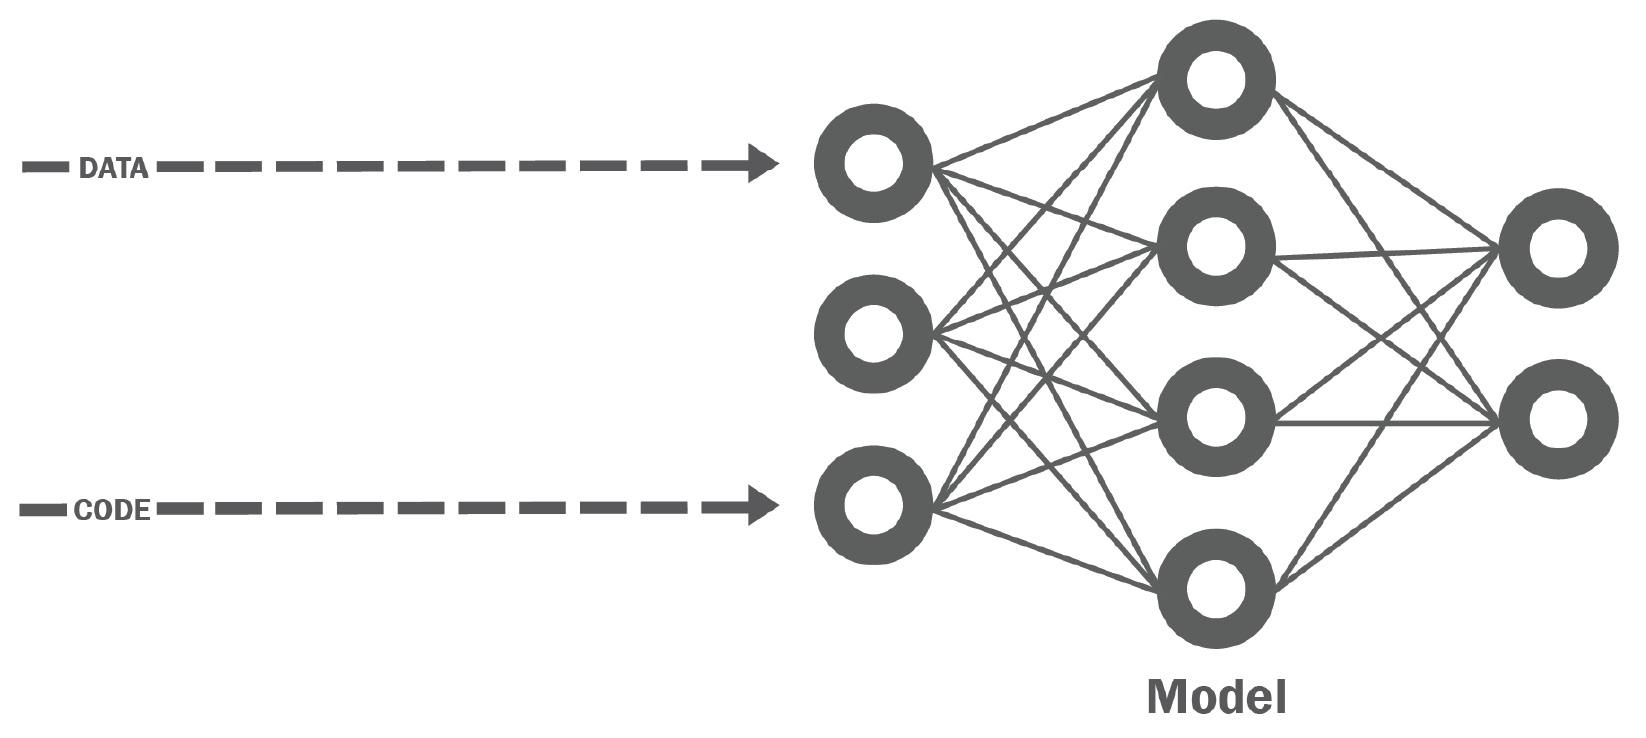 Figure 1.5 – Machine learning = data + code